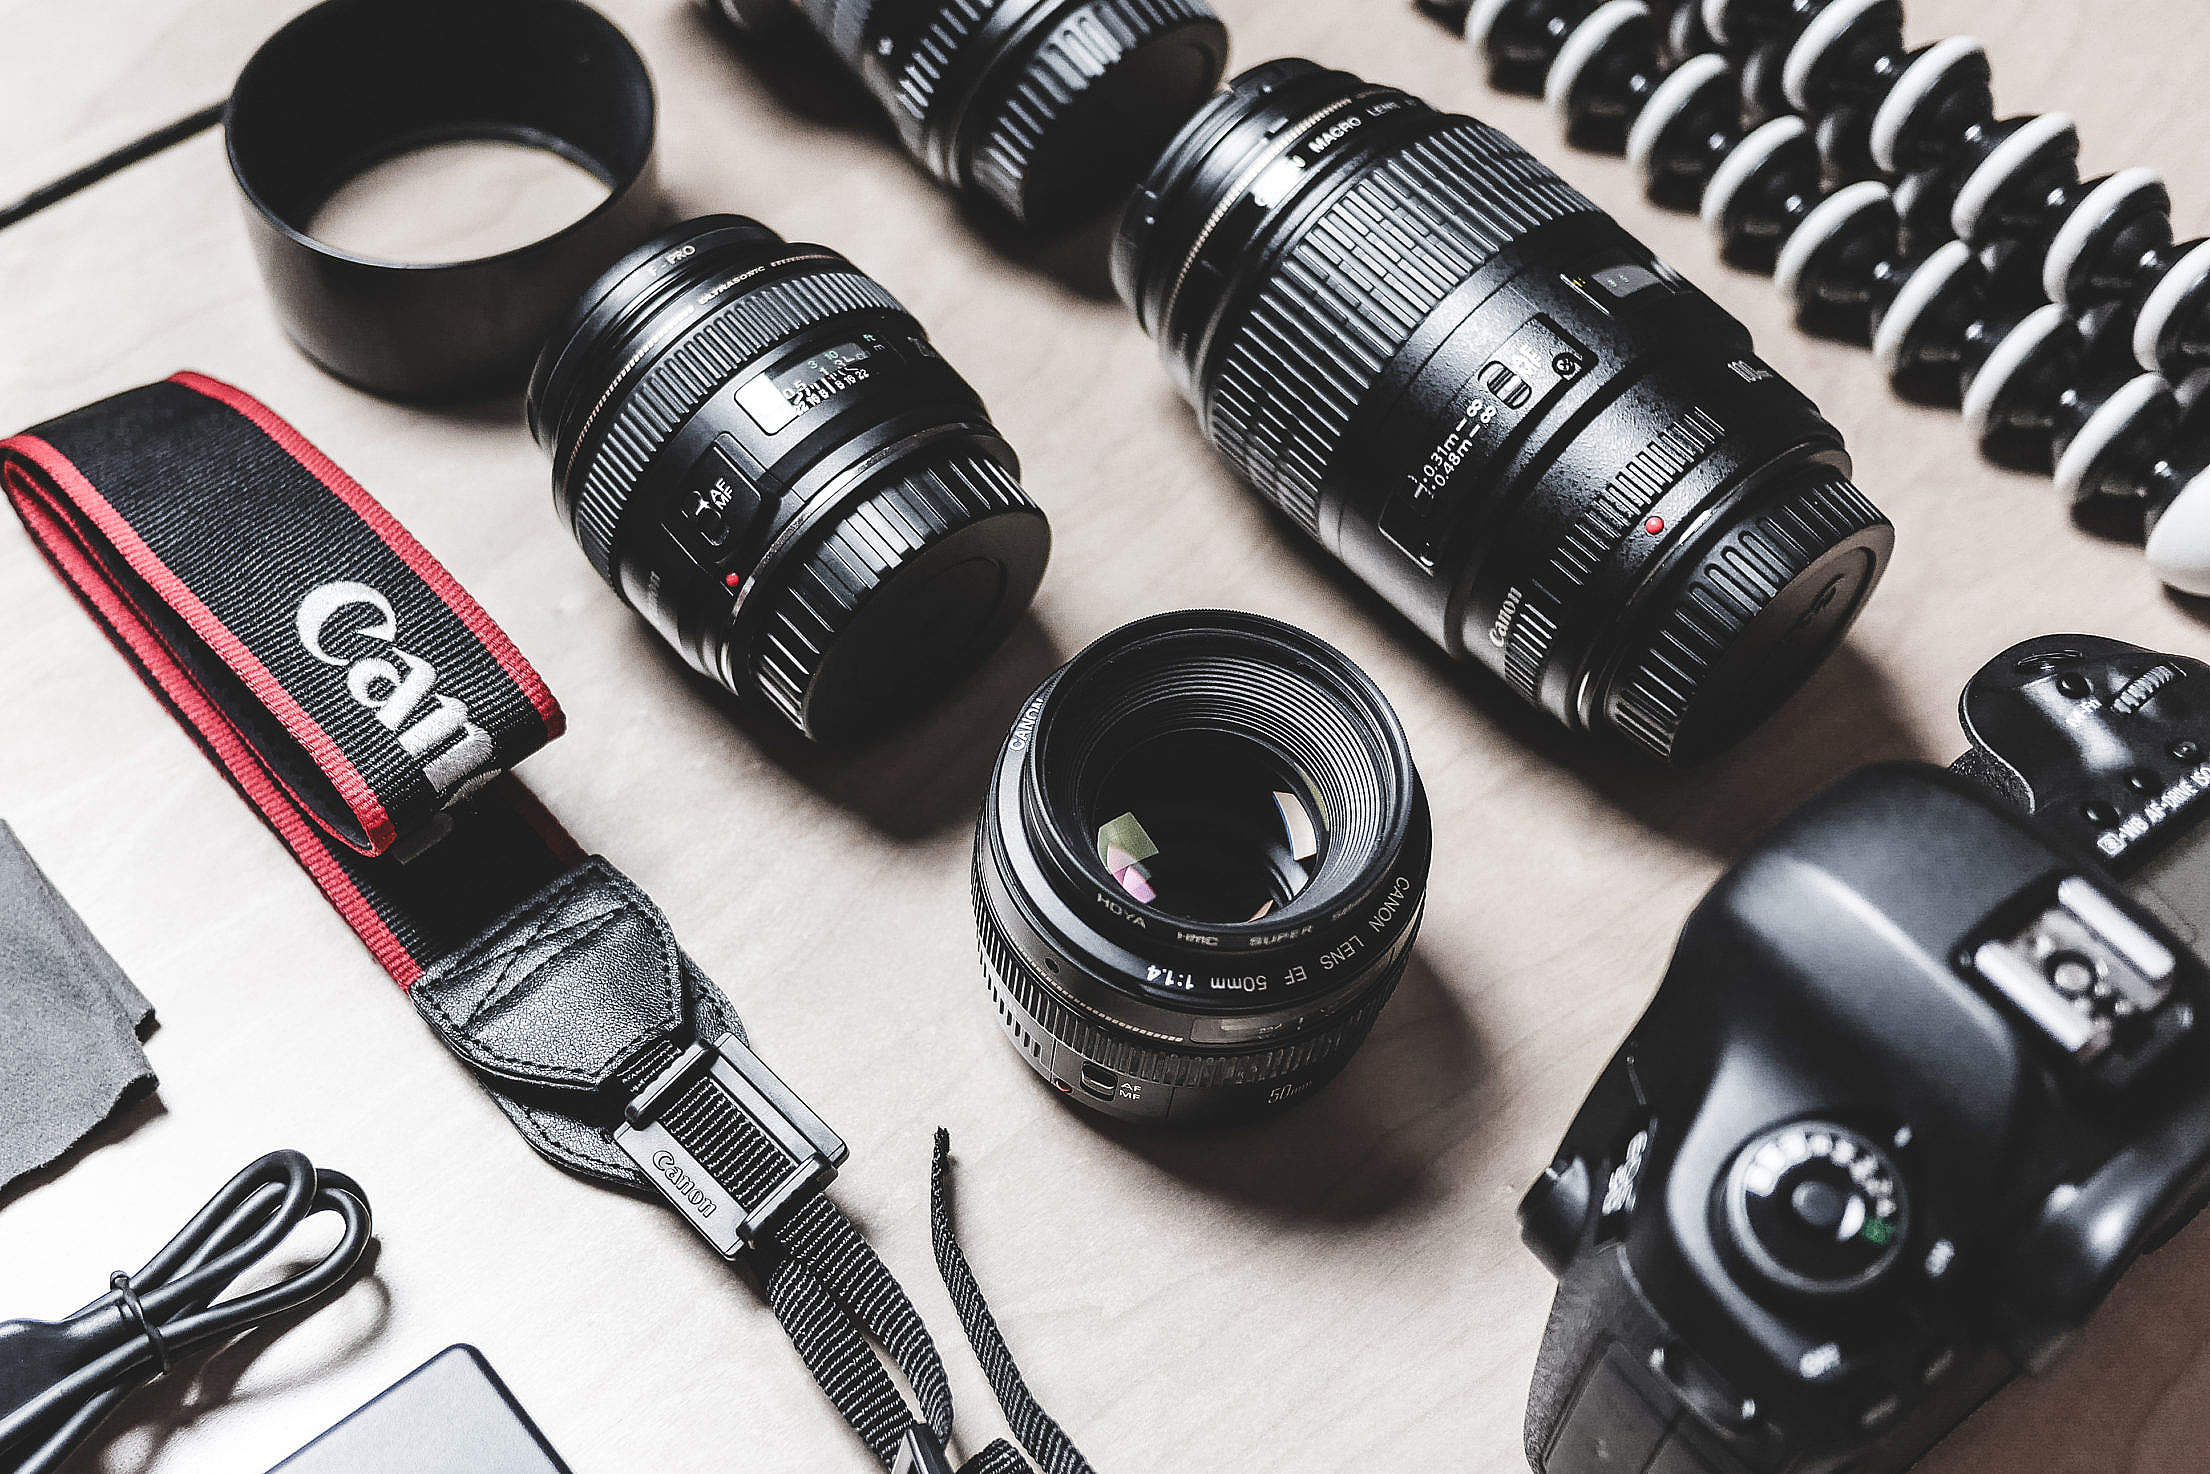 Professional Photographer DSLR Camera & Lens Equipment Free Stock Photo